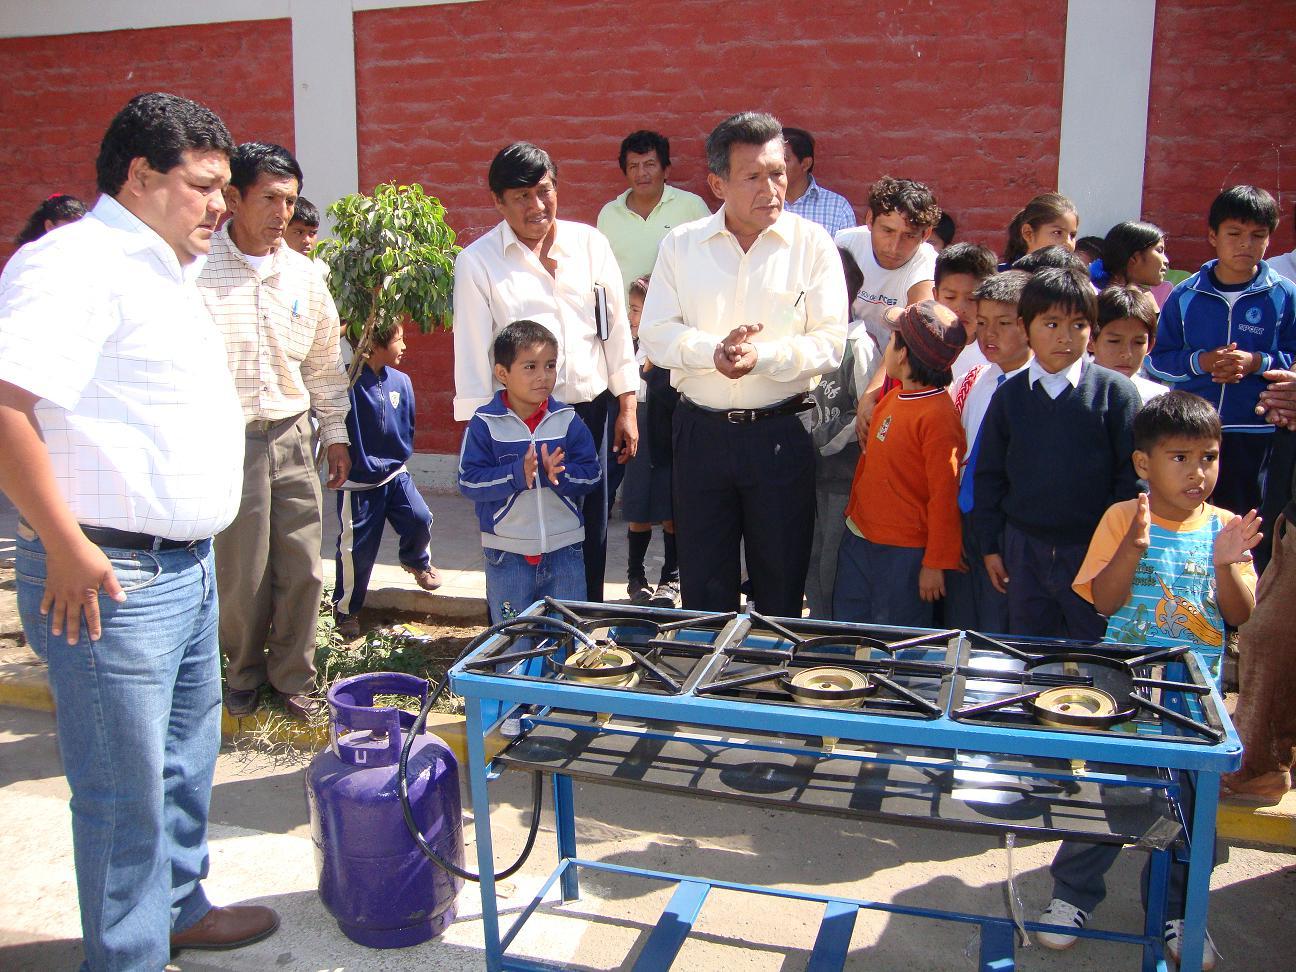 Nazcapress implementan comedor estudiantil en el porvenir for Comedor estudiantil